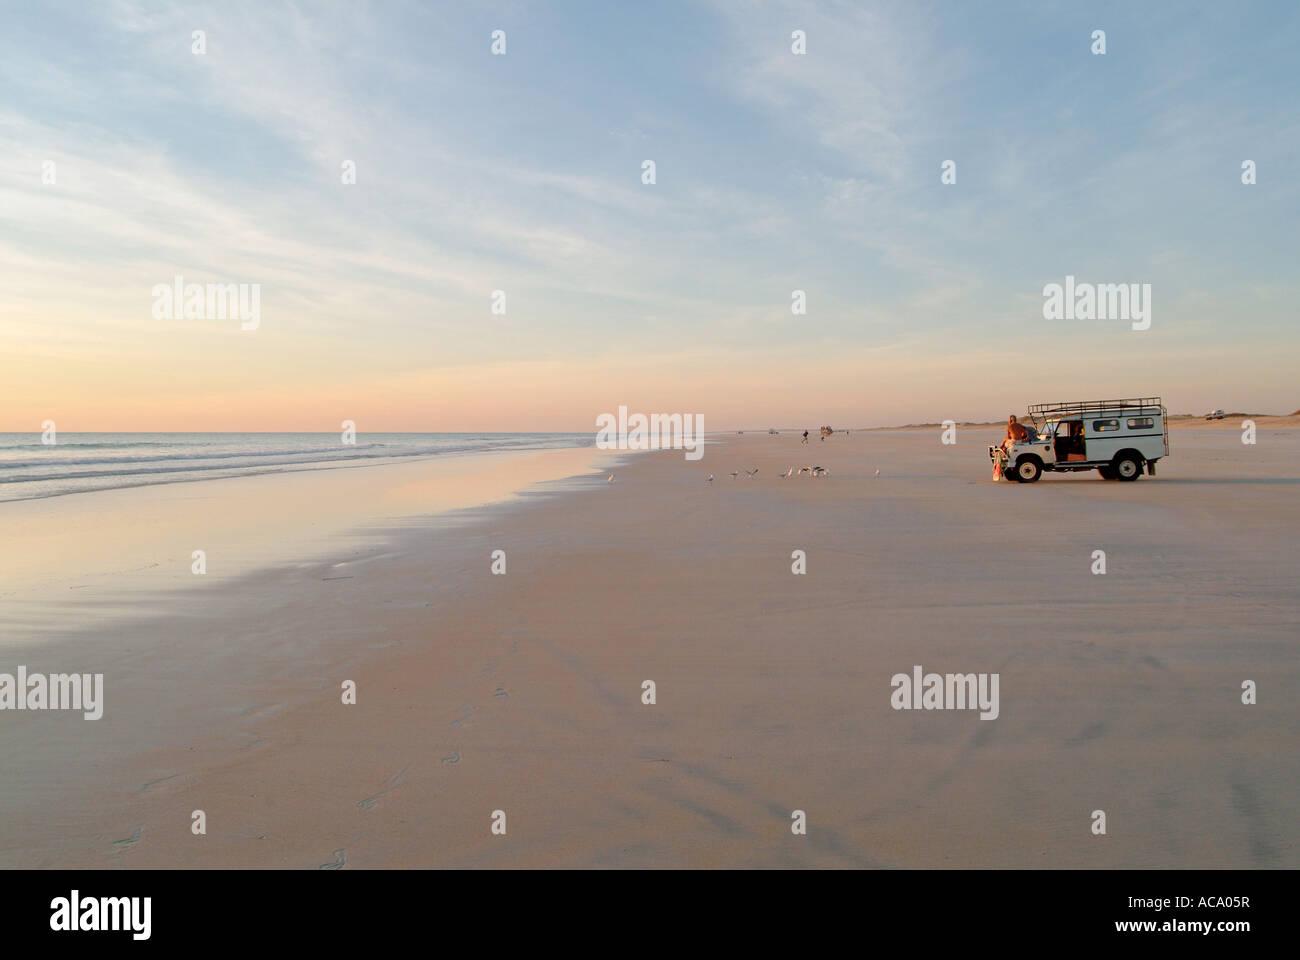 Off-road vehicle, Cable Beach, Broome, Kimberleys, Western Australia - Stock Image